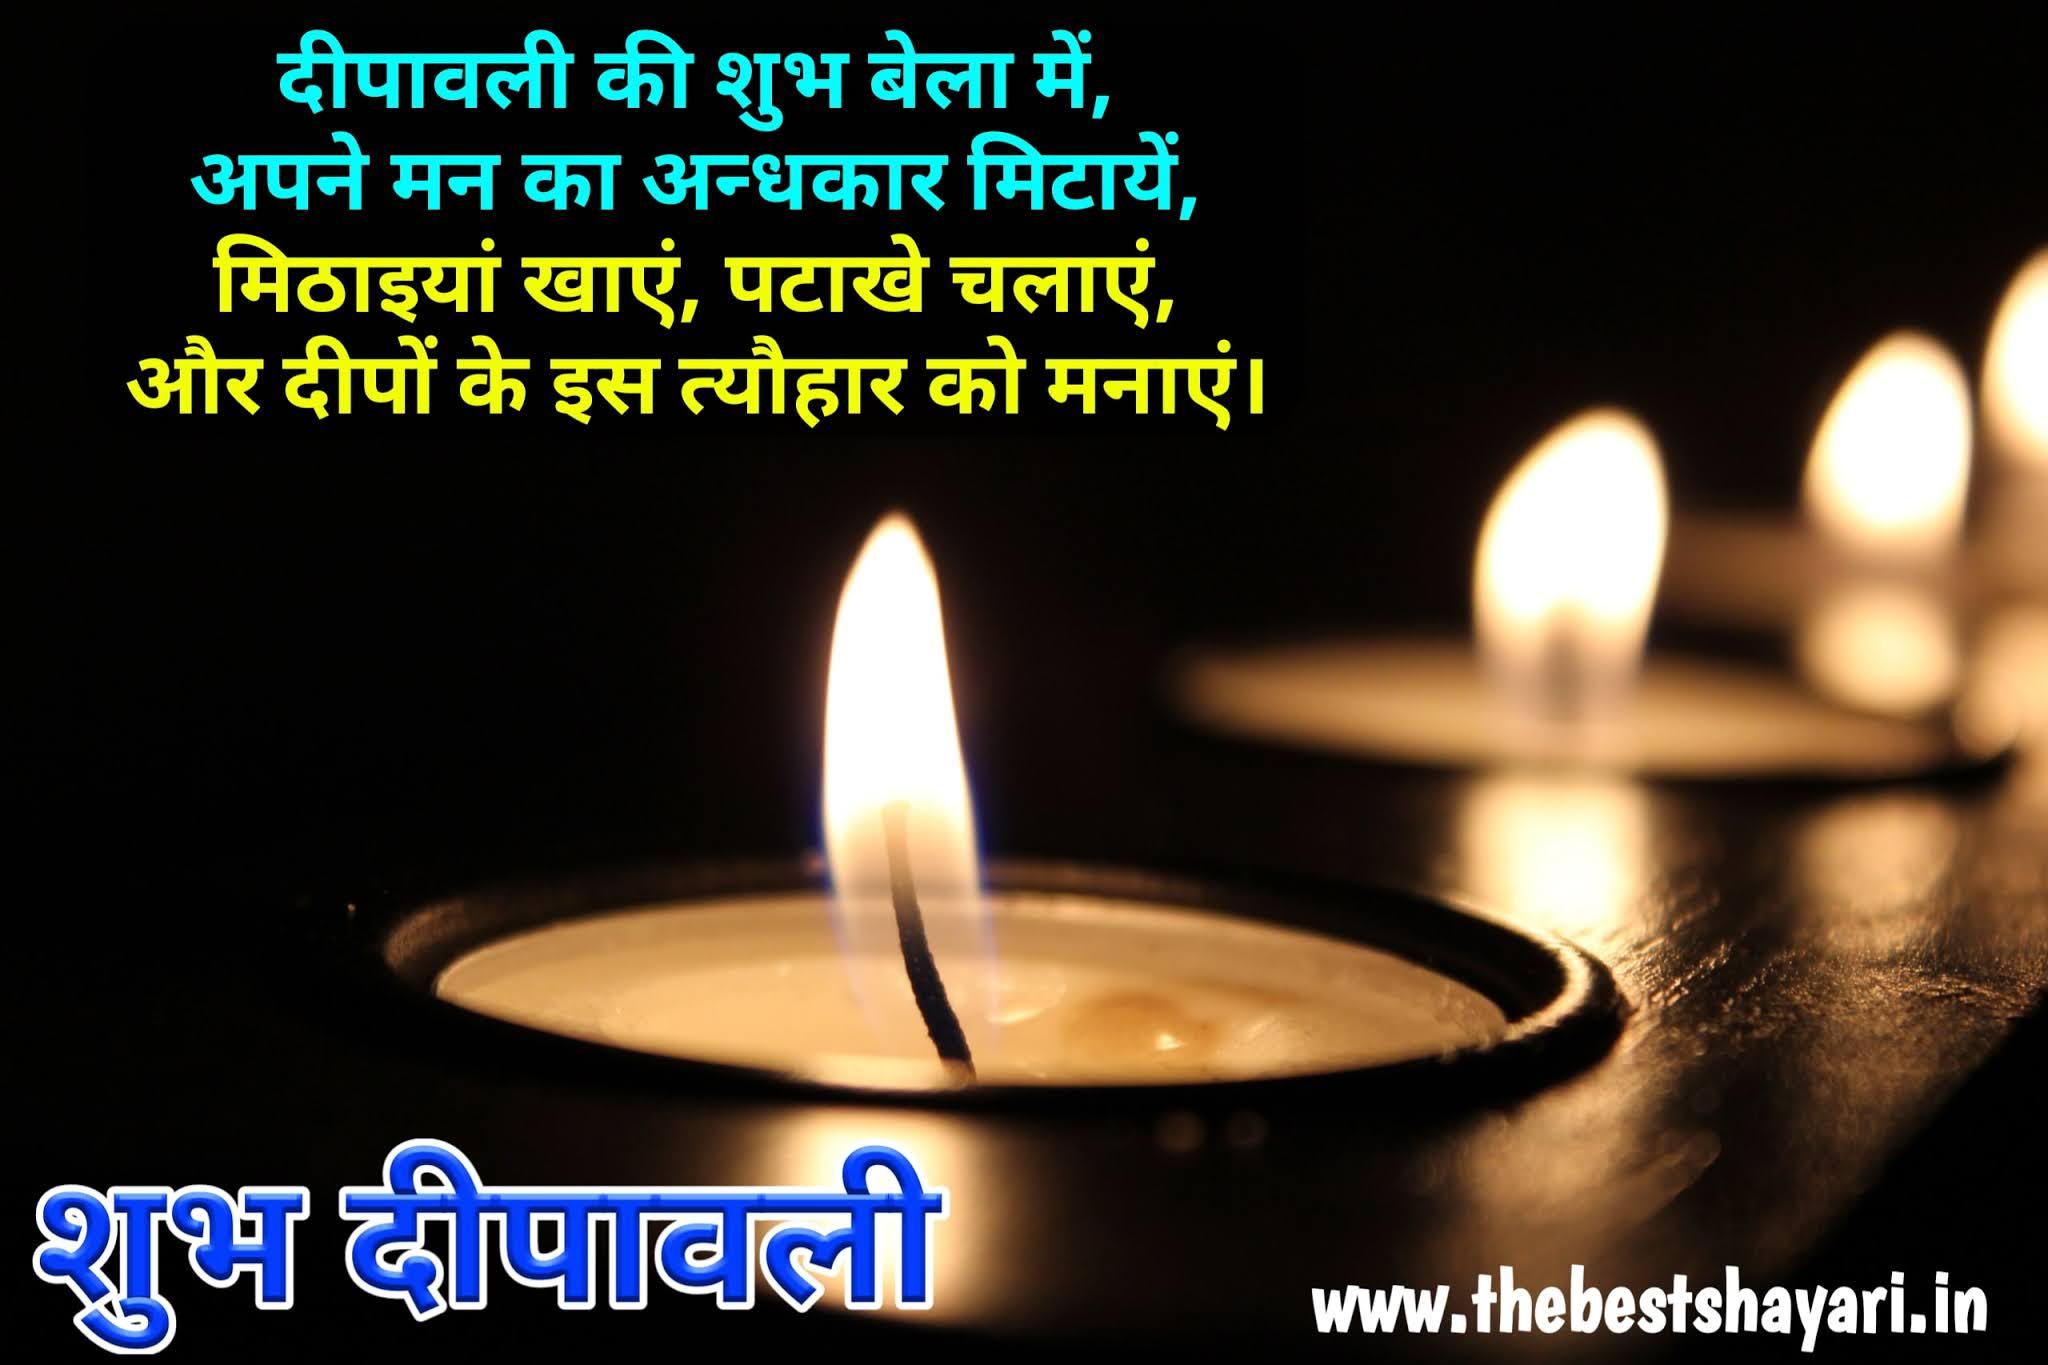 best wishes of diwali